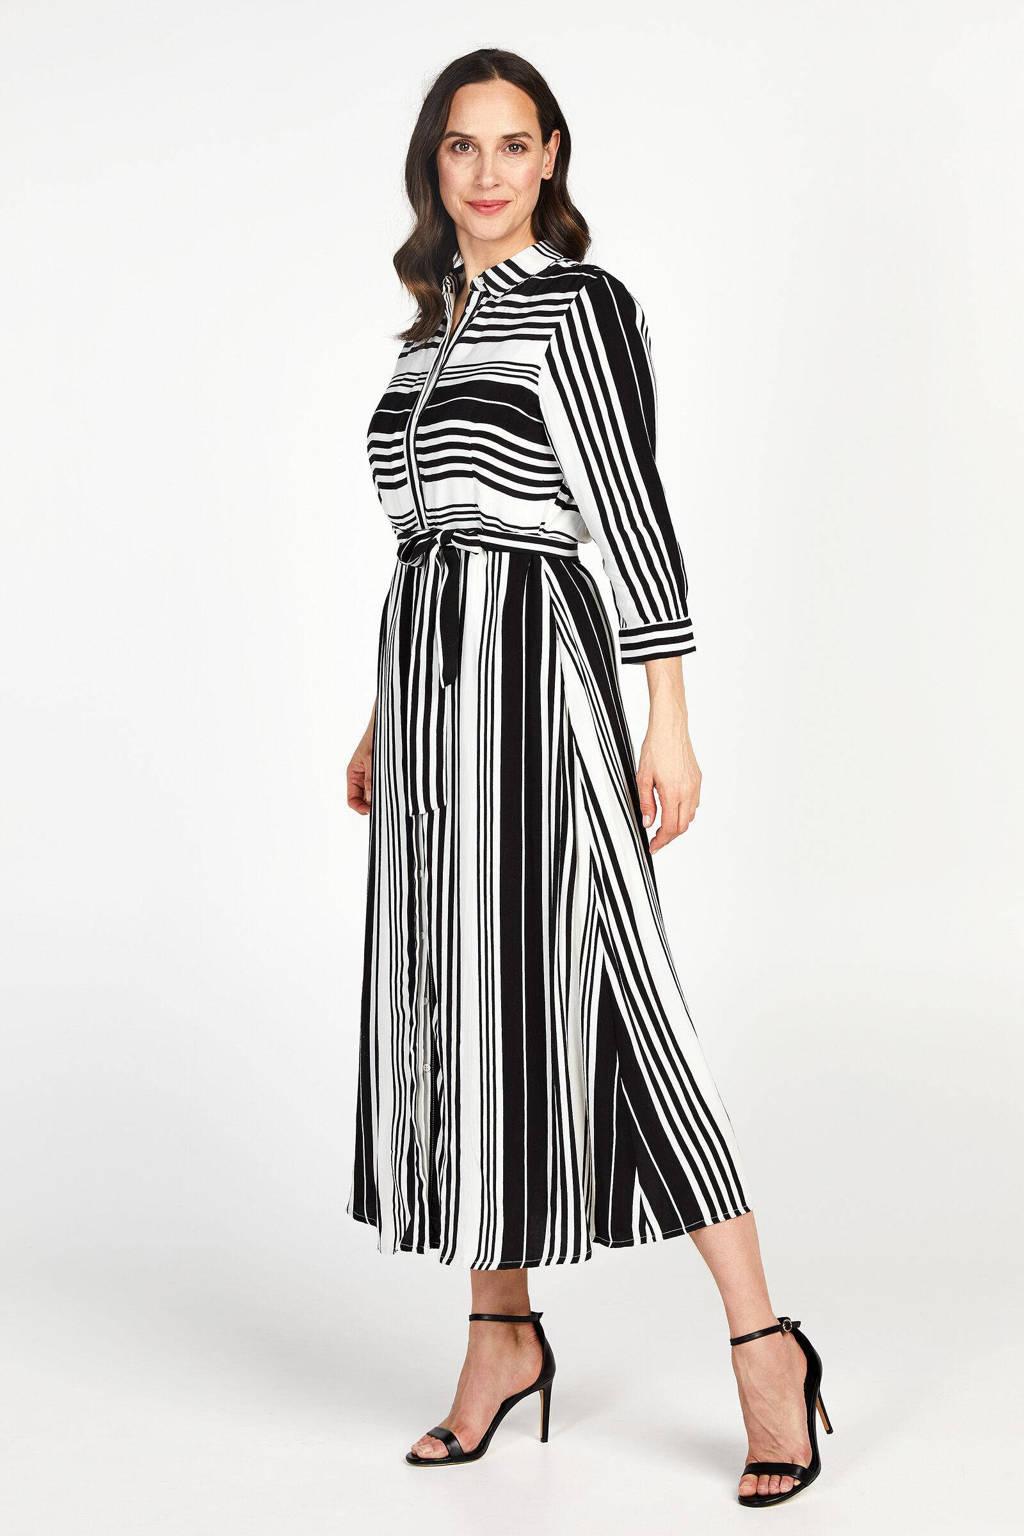 PROMISS gestreepte maxi jurk zwart/wit, Zwart/wit